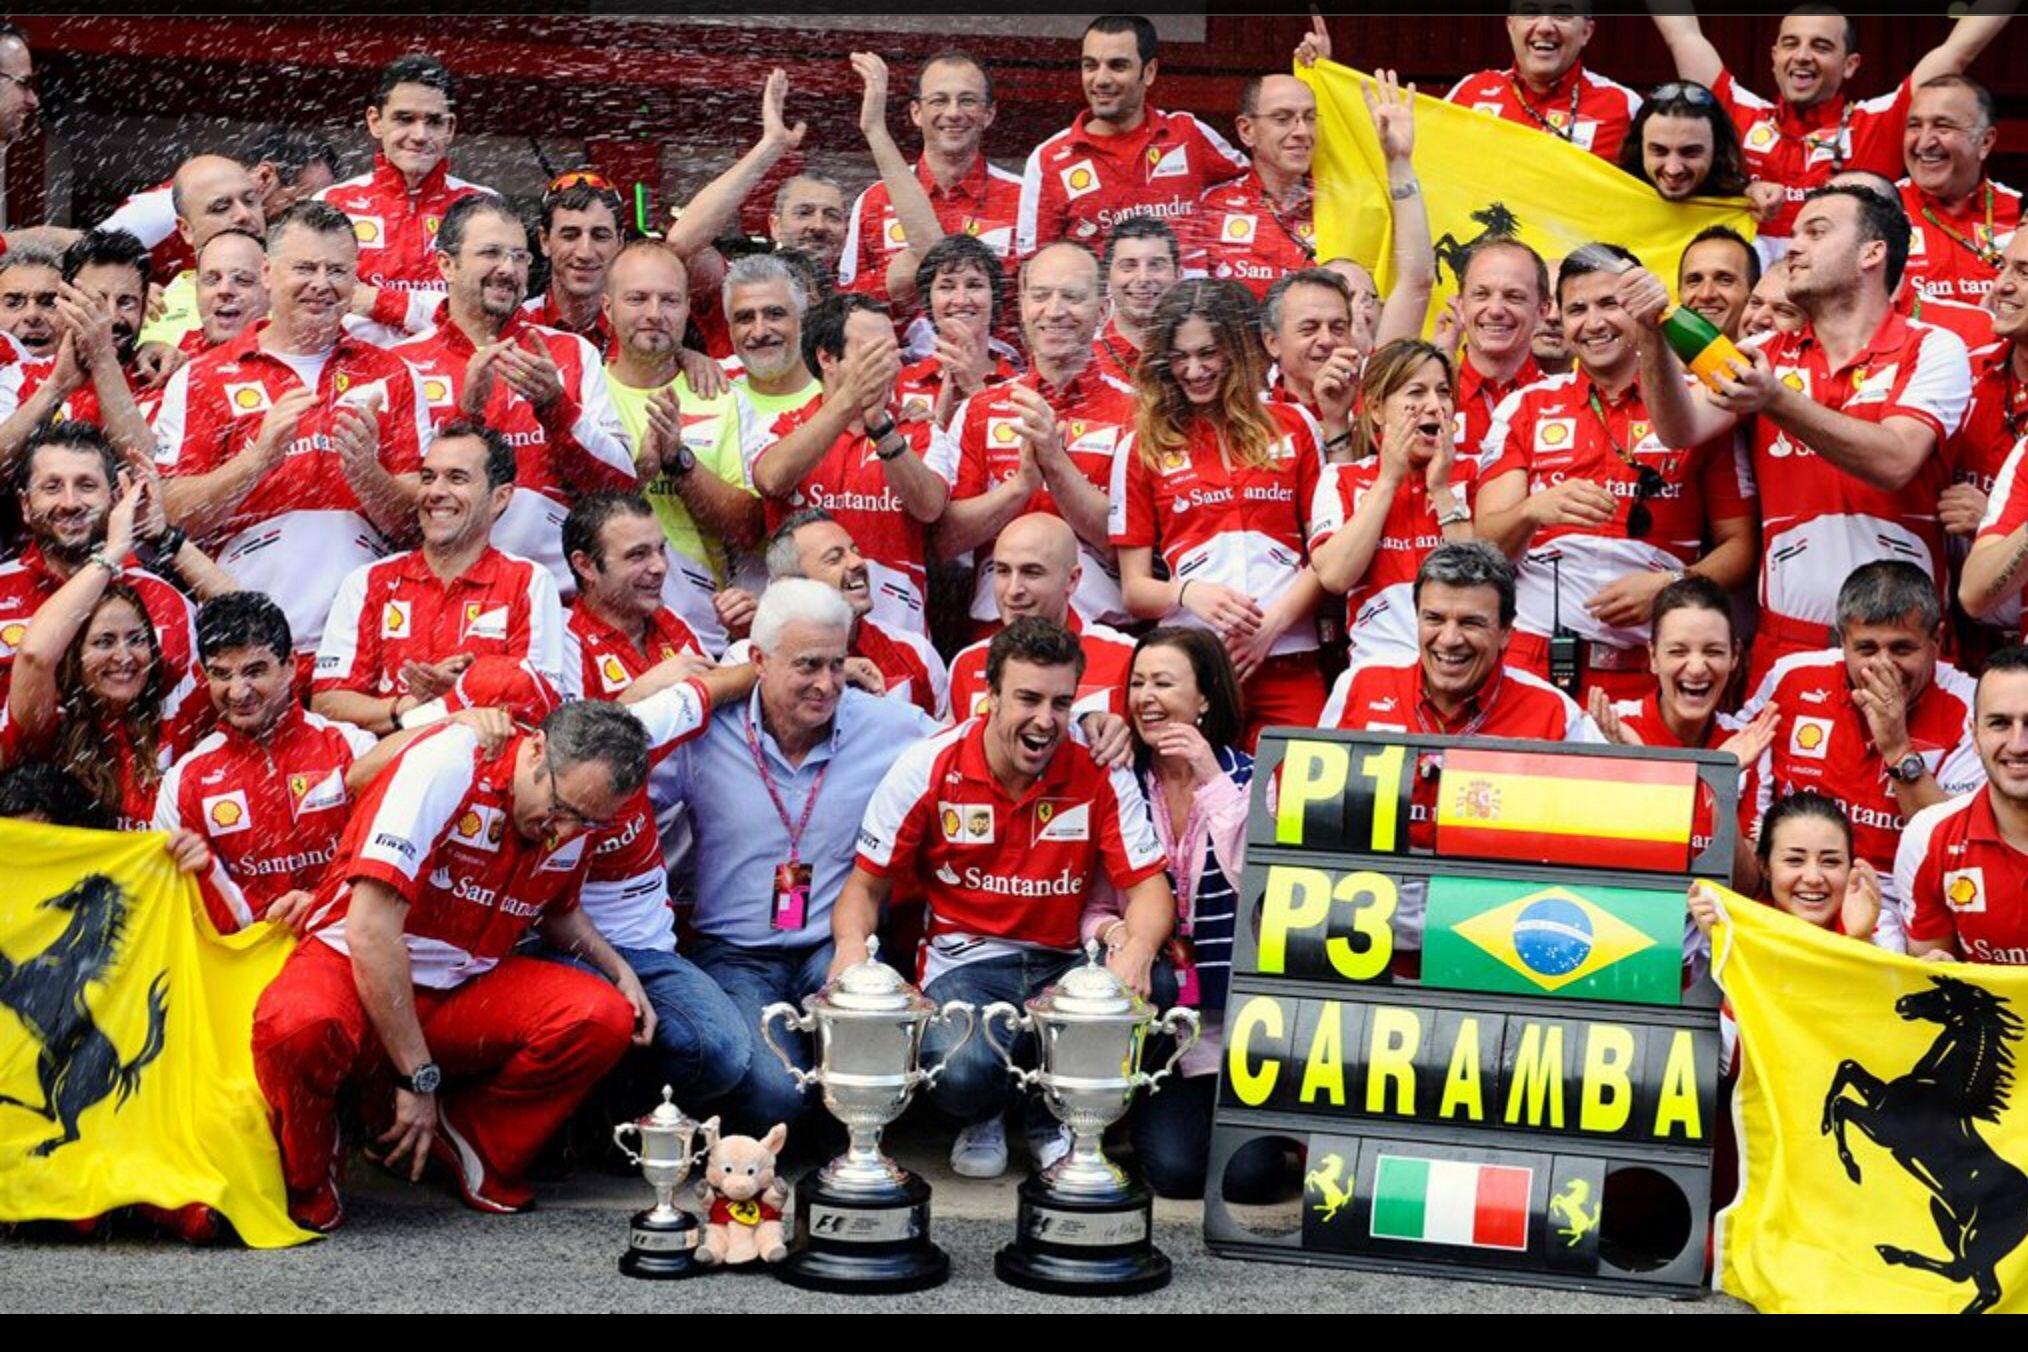 F.Alonso Race winner 2013 -Grand Premio de España